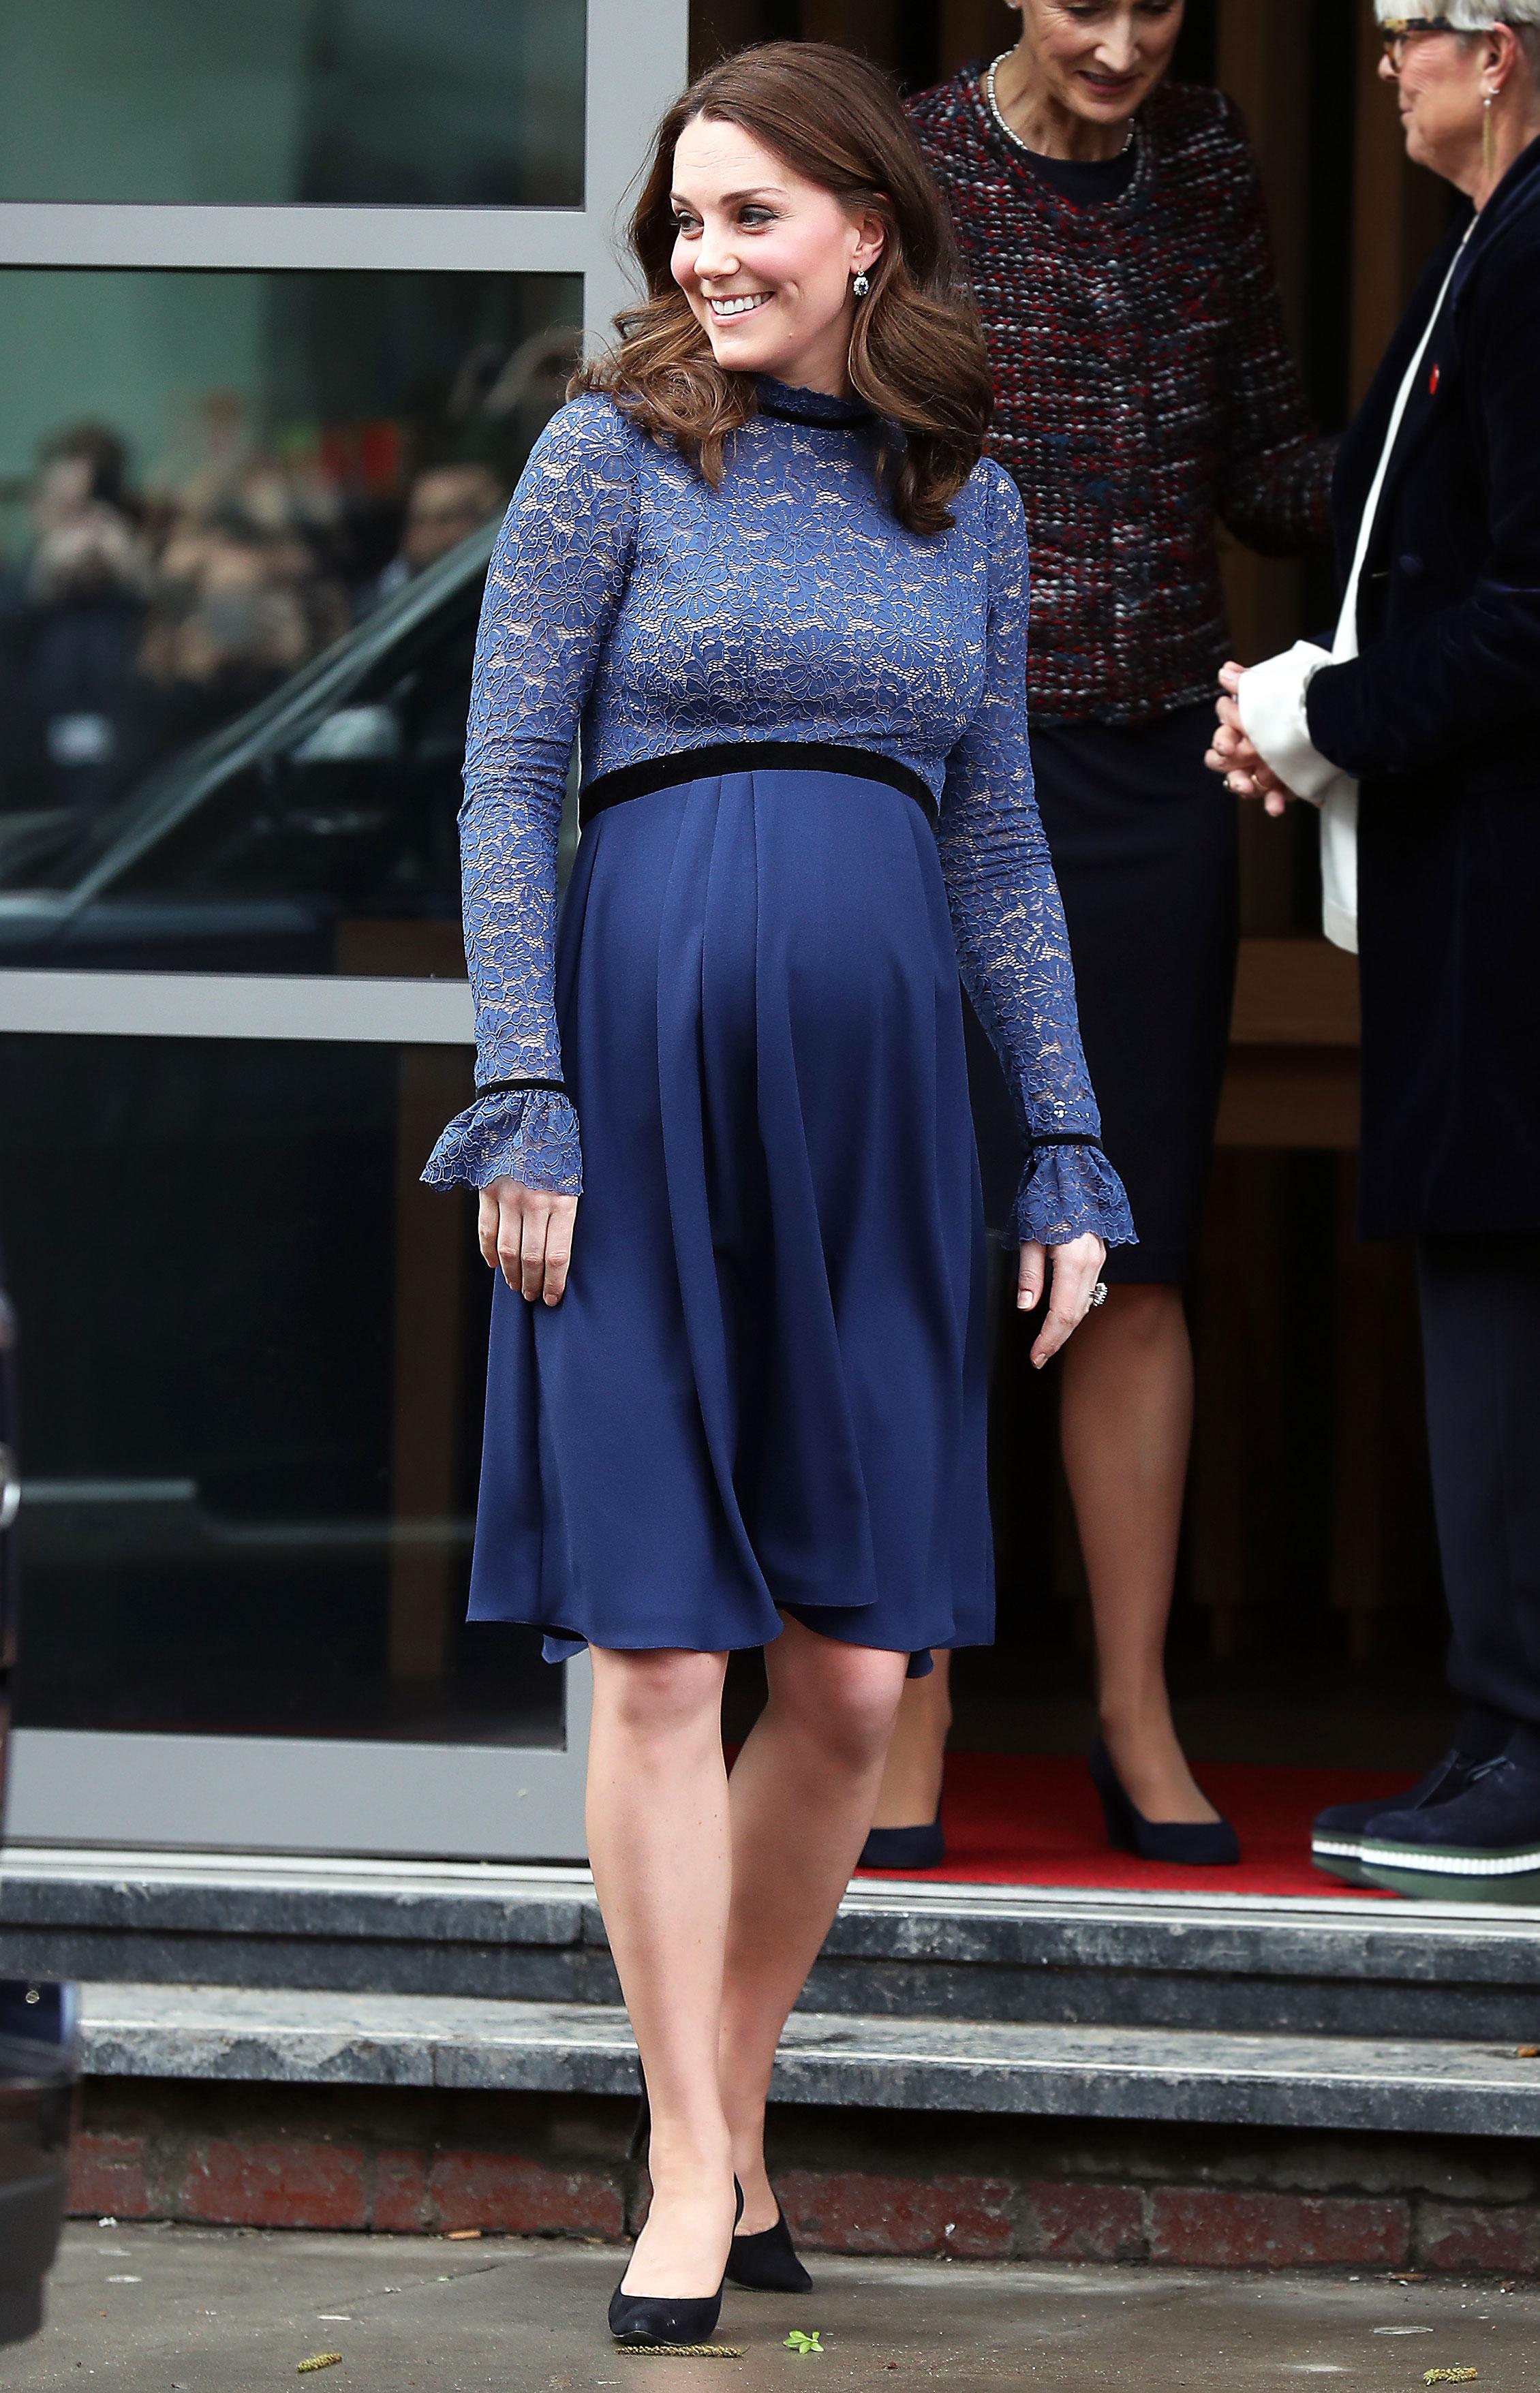 kate middleton maternity style third pregnancy pics